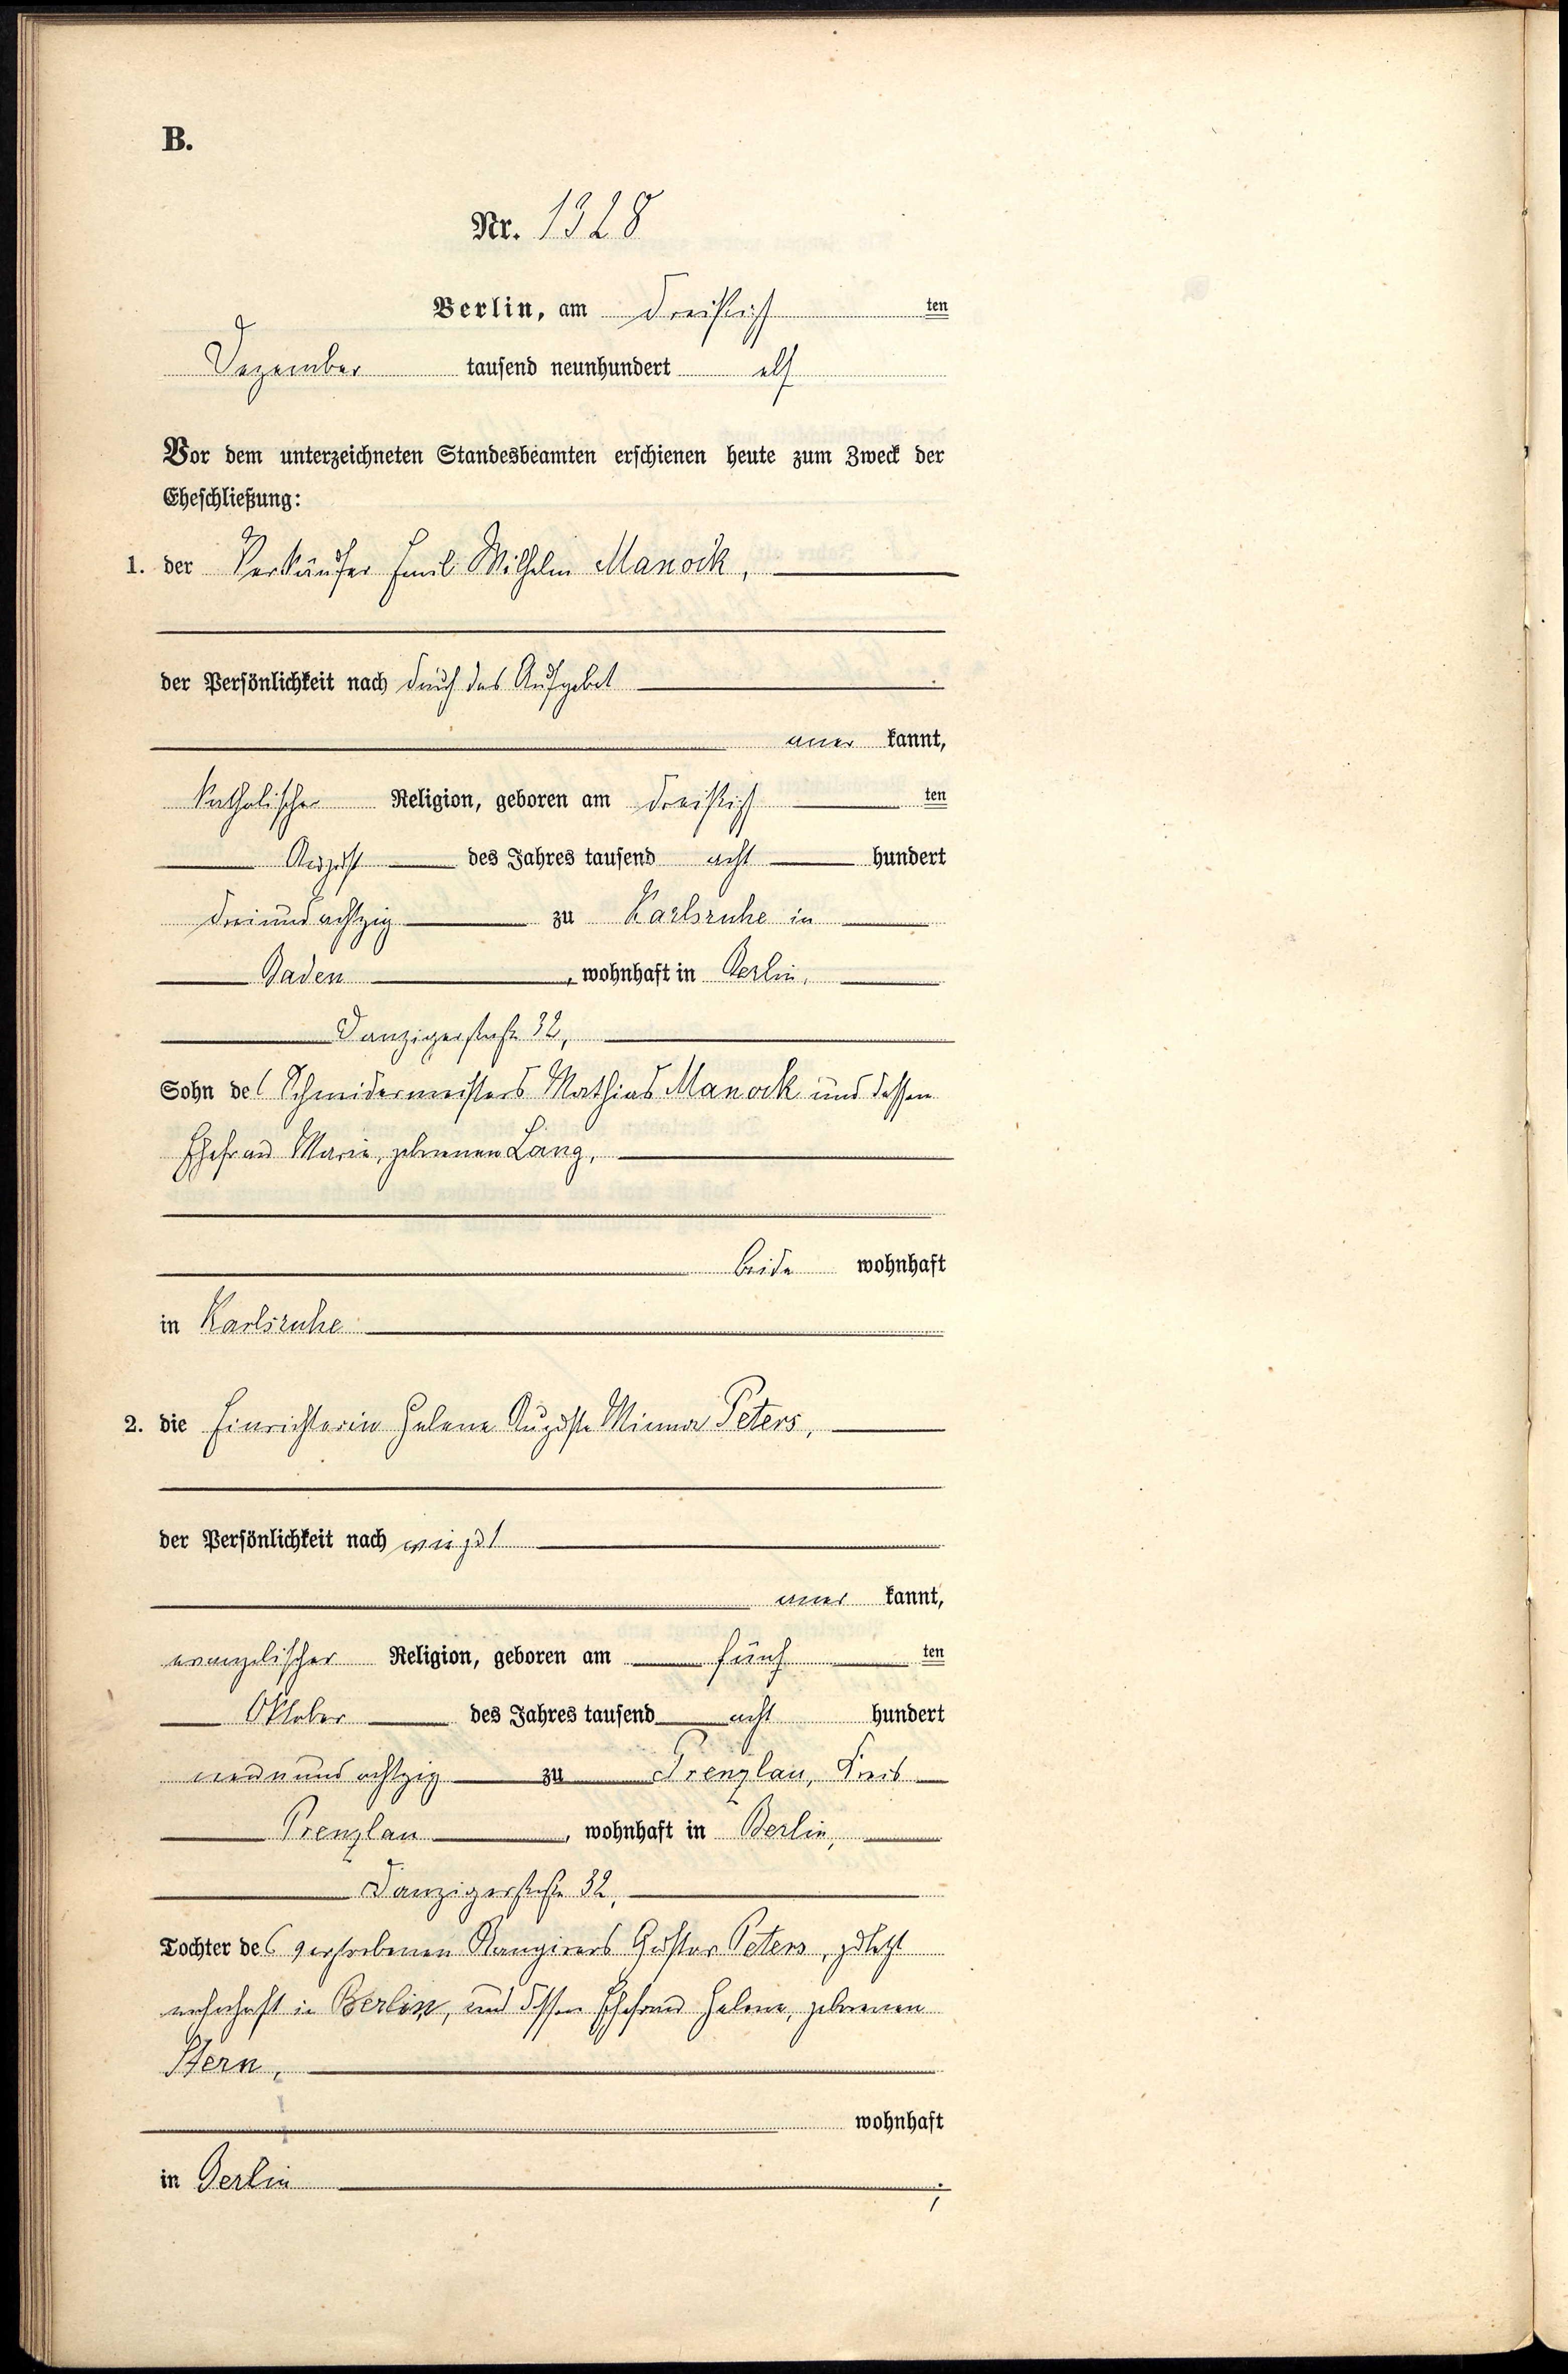 Manock Peters marriage 1911